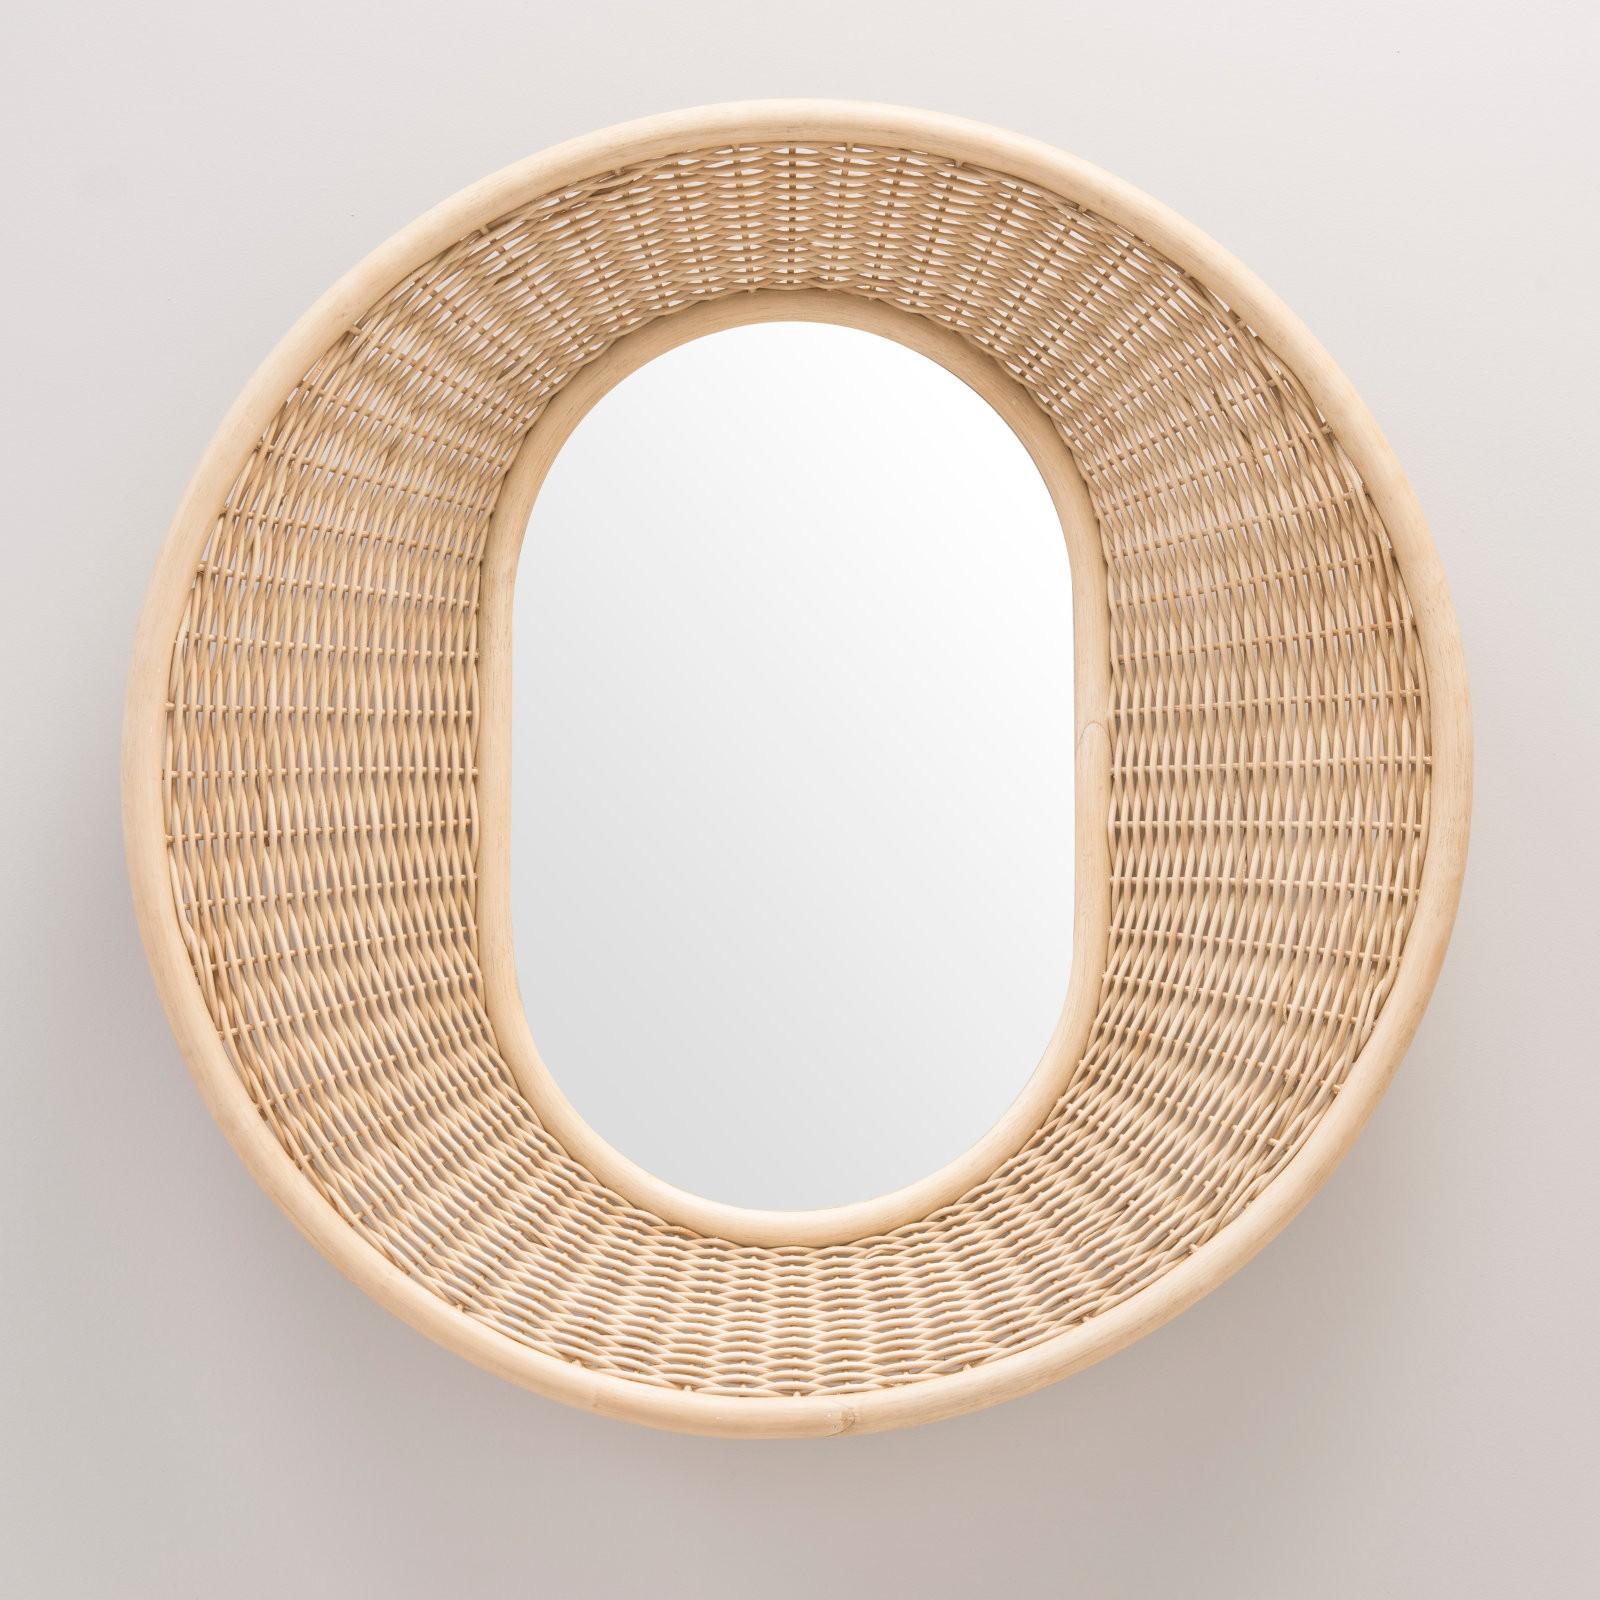 Mooyod Pendant Miroir Rotin Tournesol Circulaire Miroir Mural D/écor Boho Osier Coiffeuse Maquillage Miroirs